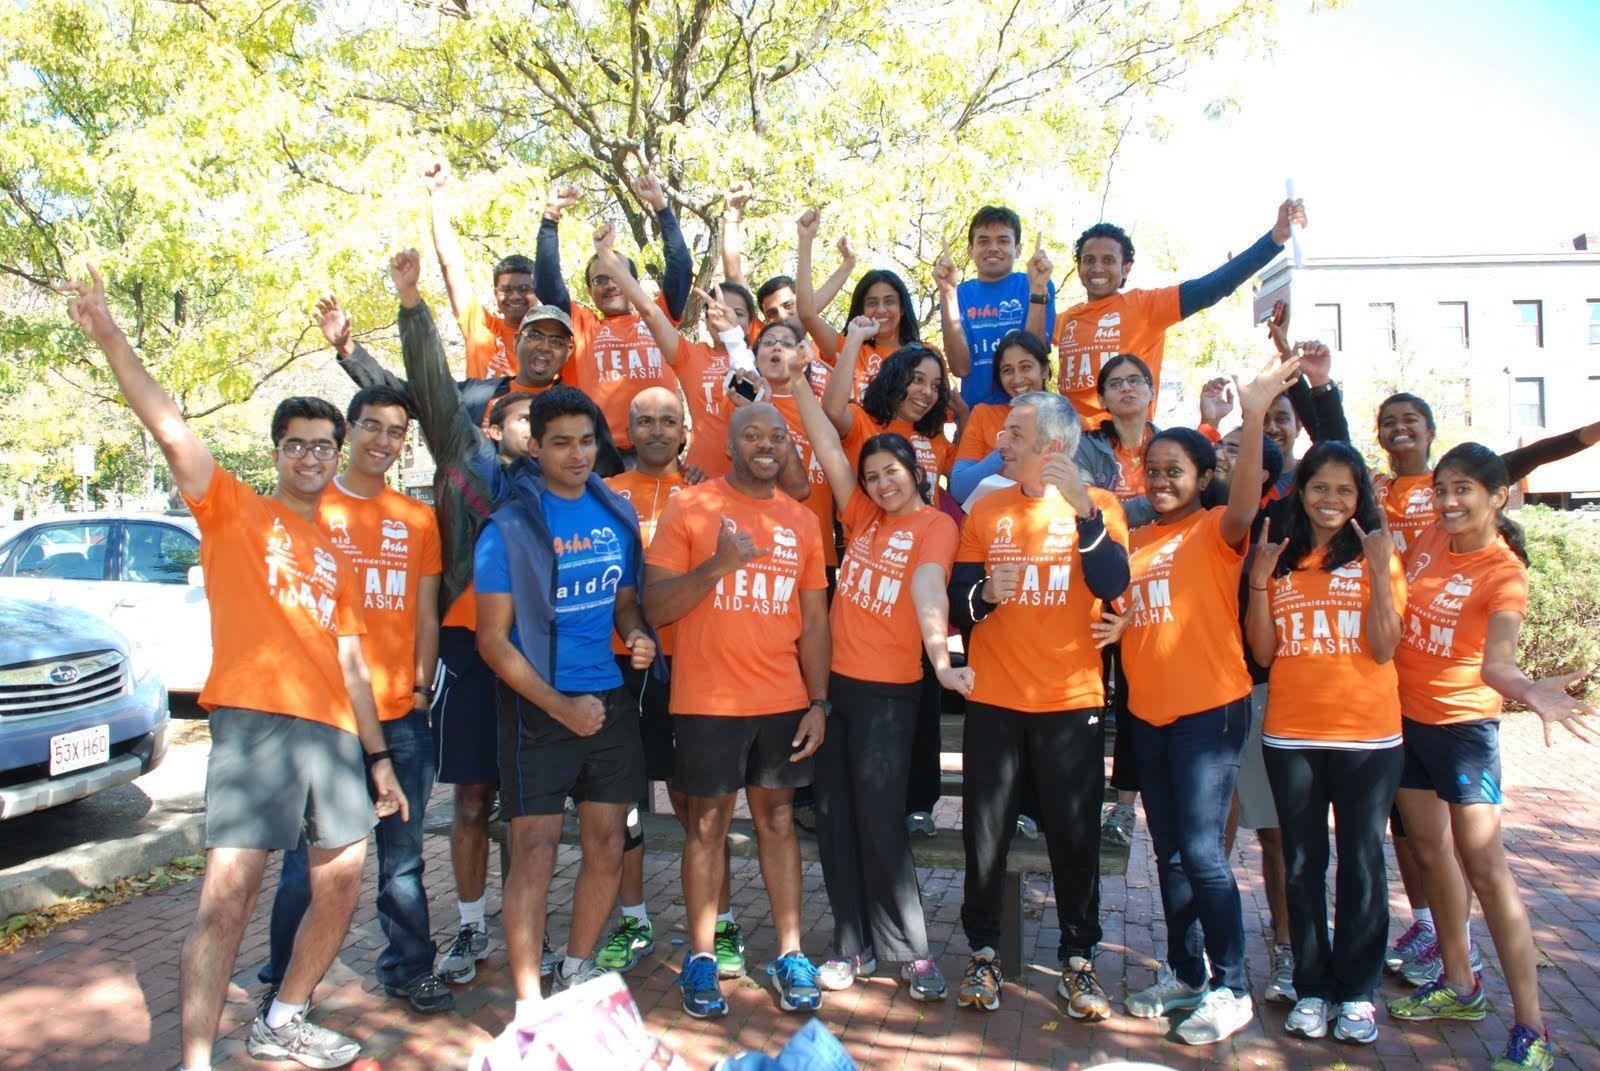 Beginner friendly half/full marathon training - TeamAIDAsha